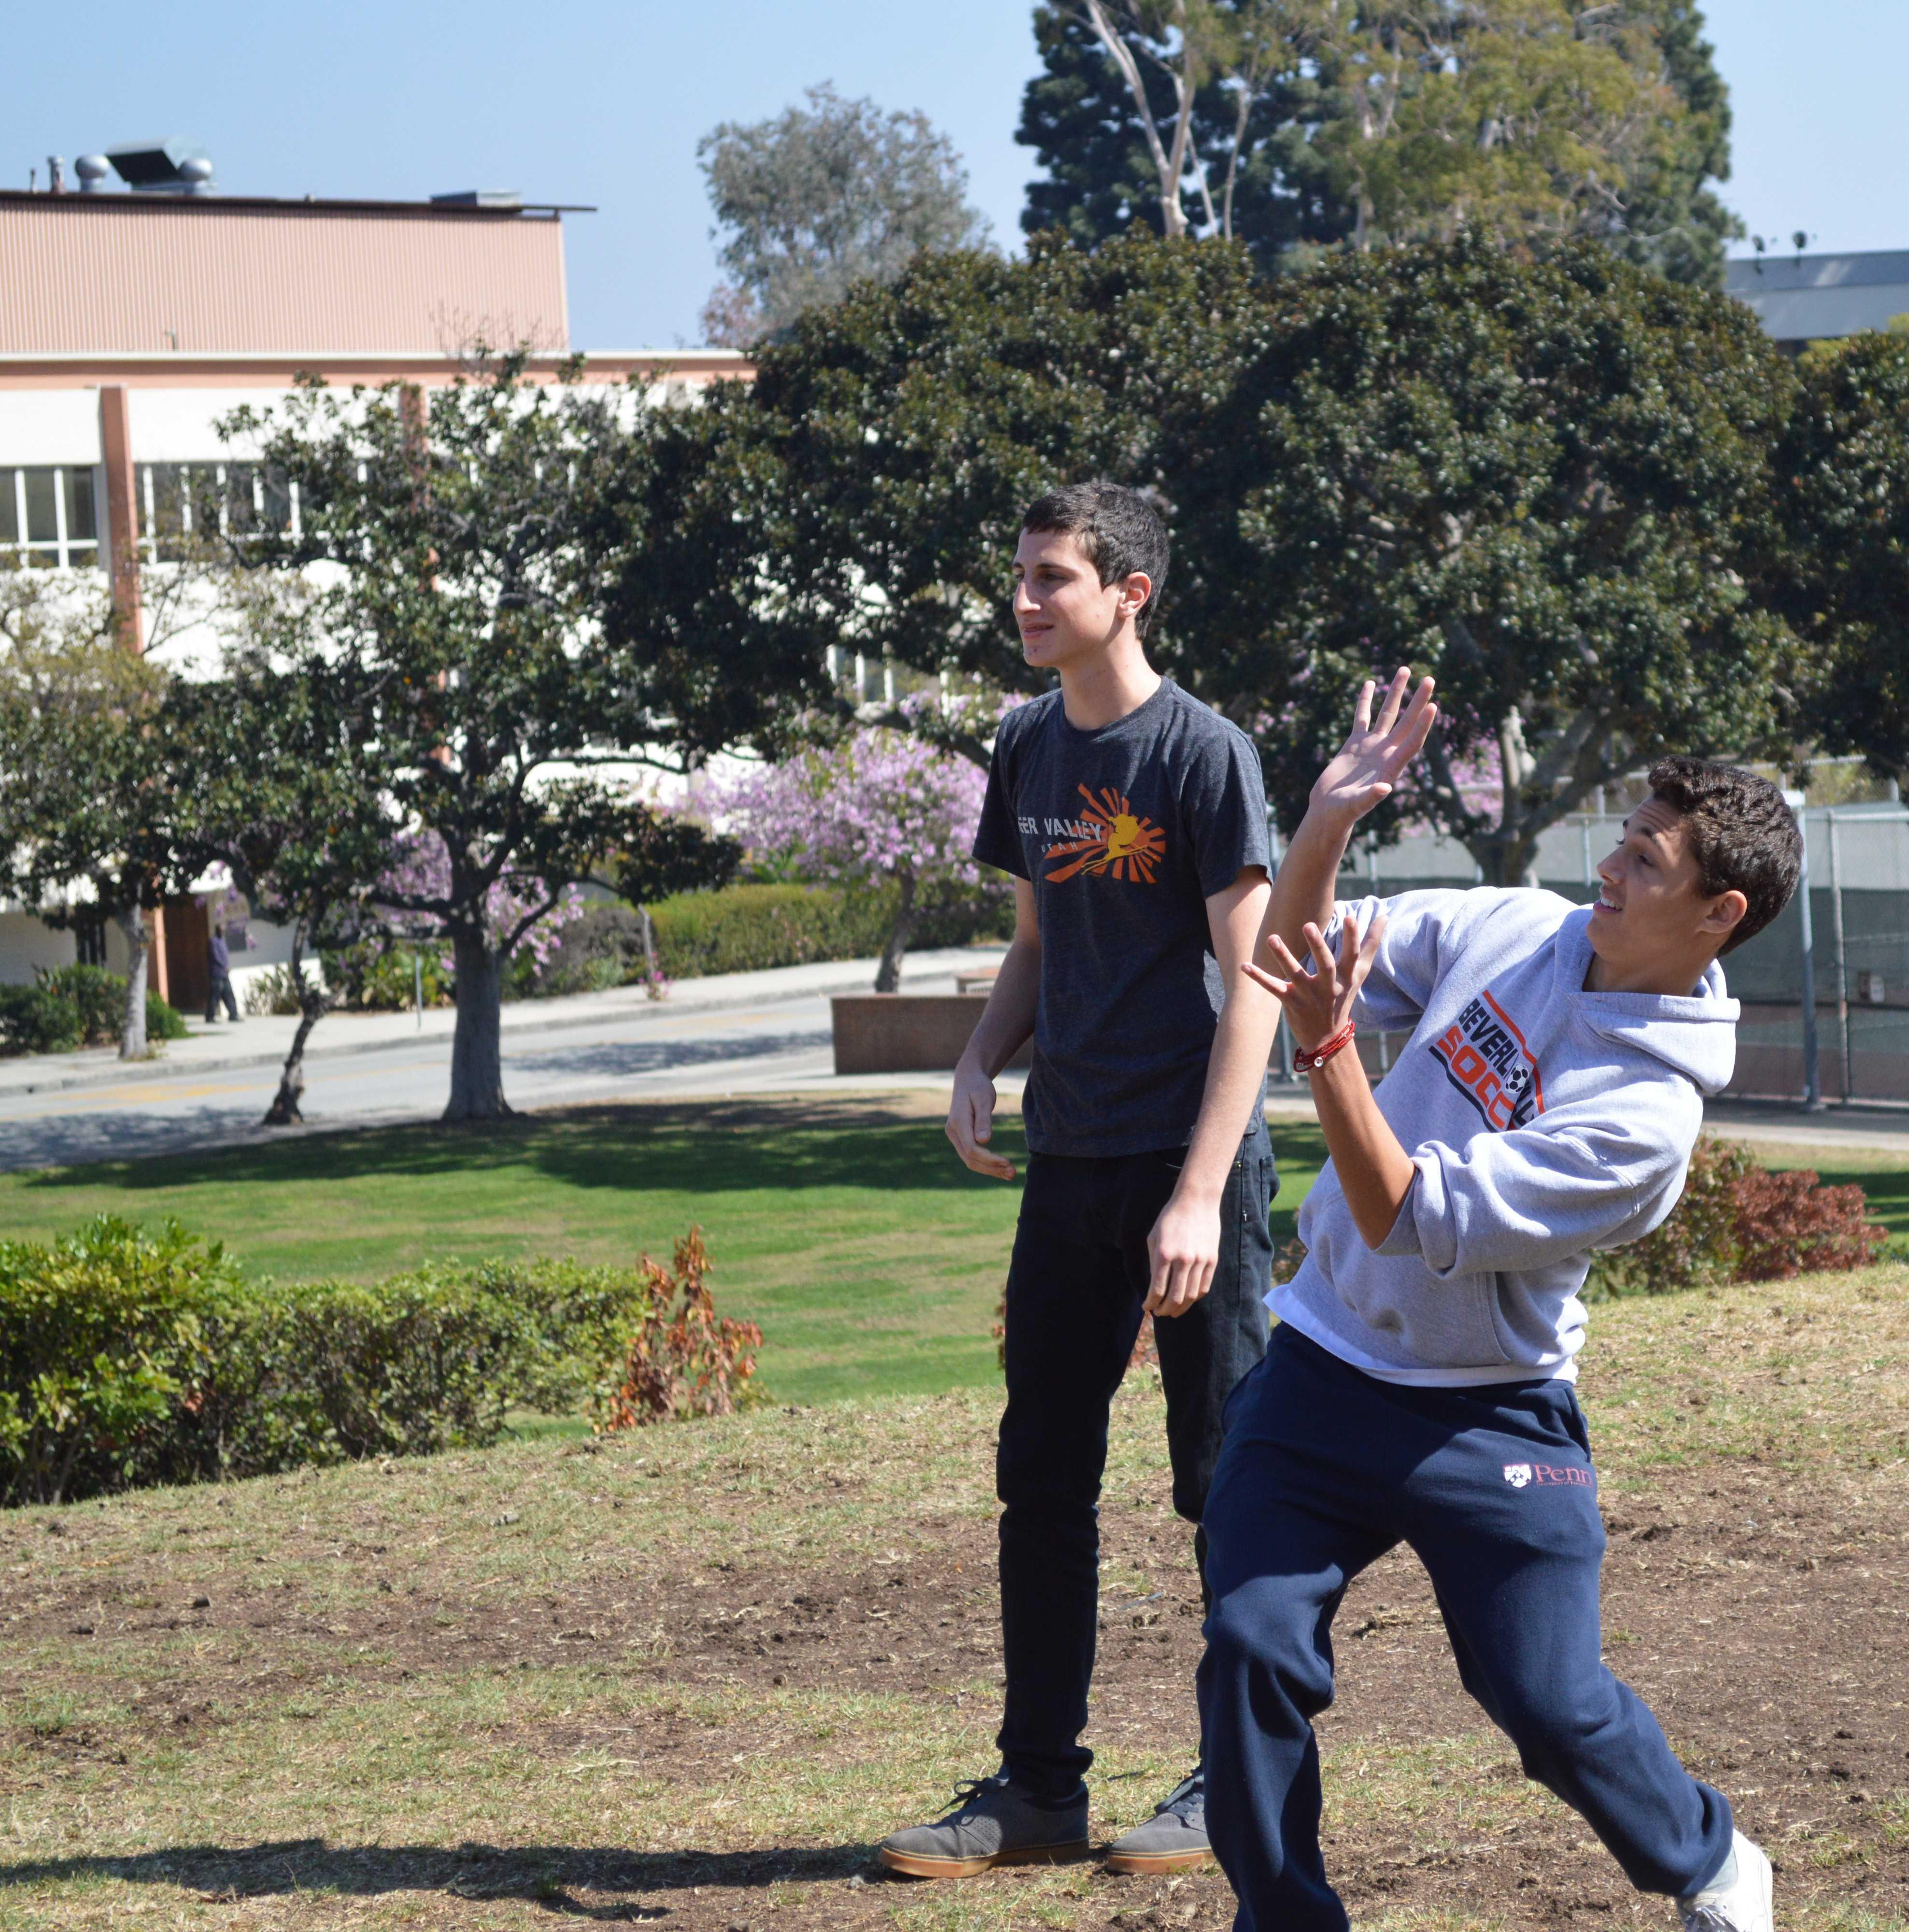 Senior Phinneas Bauer braces himself as he anticipates his partner's water balloon toss.